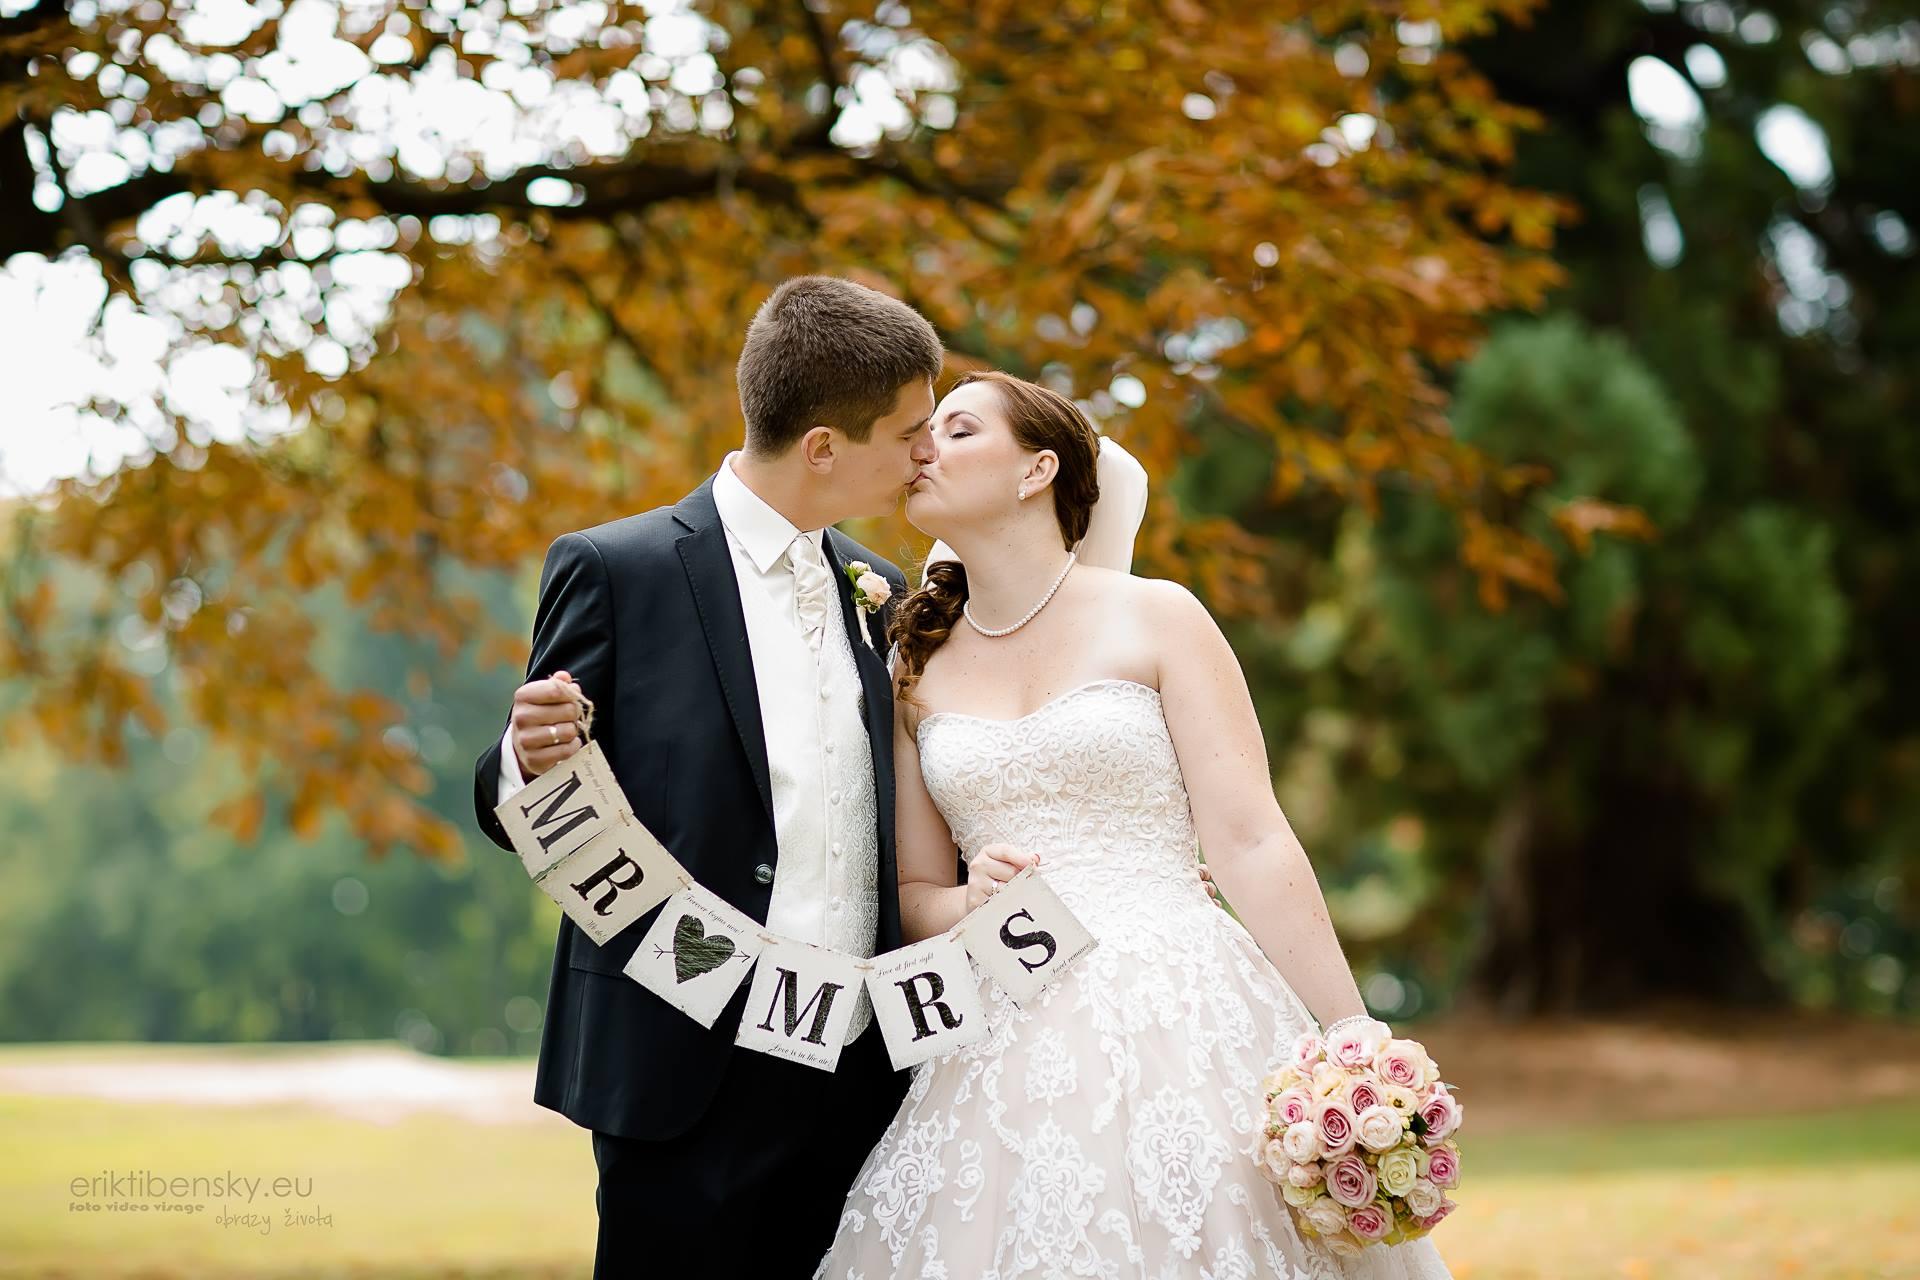 eriktibensky-eu-svadobny-fotograf-wedding-photographer-3088